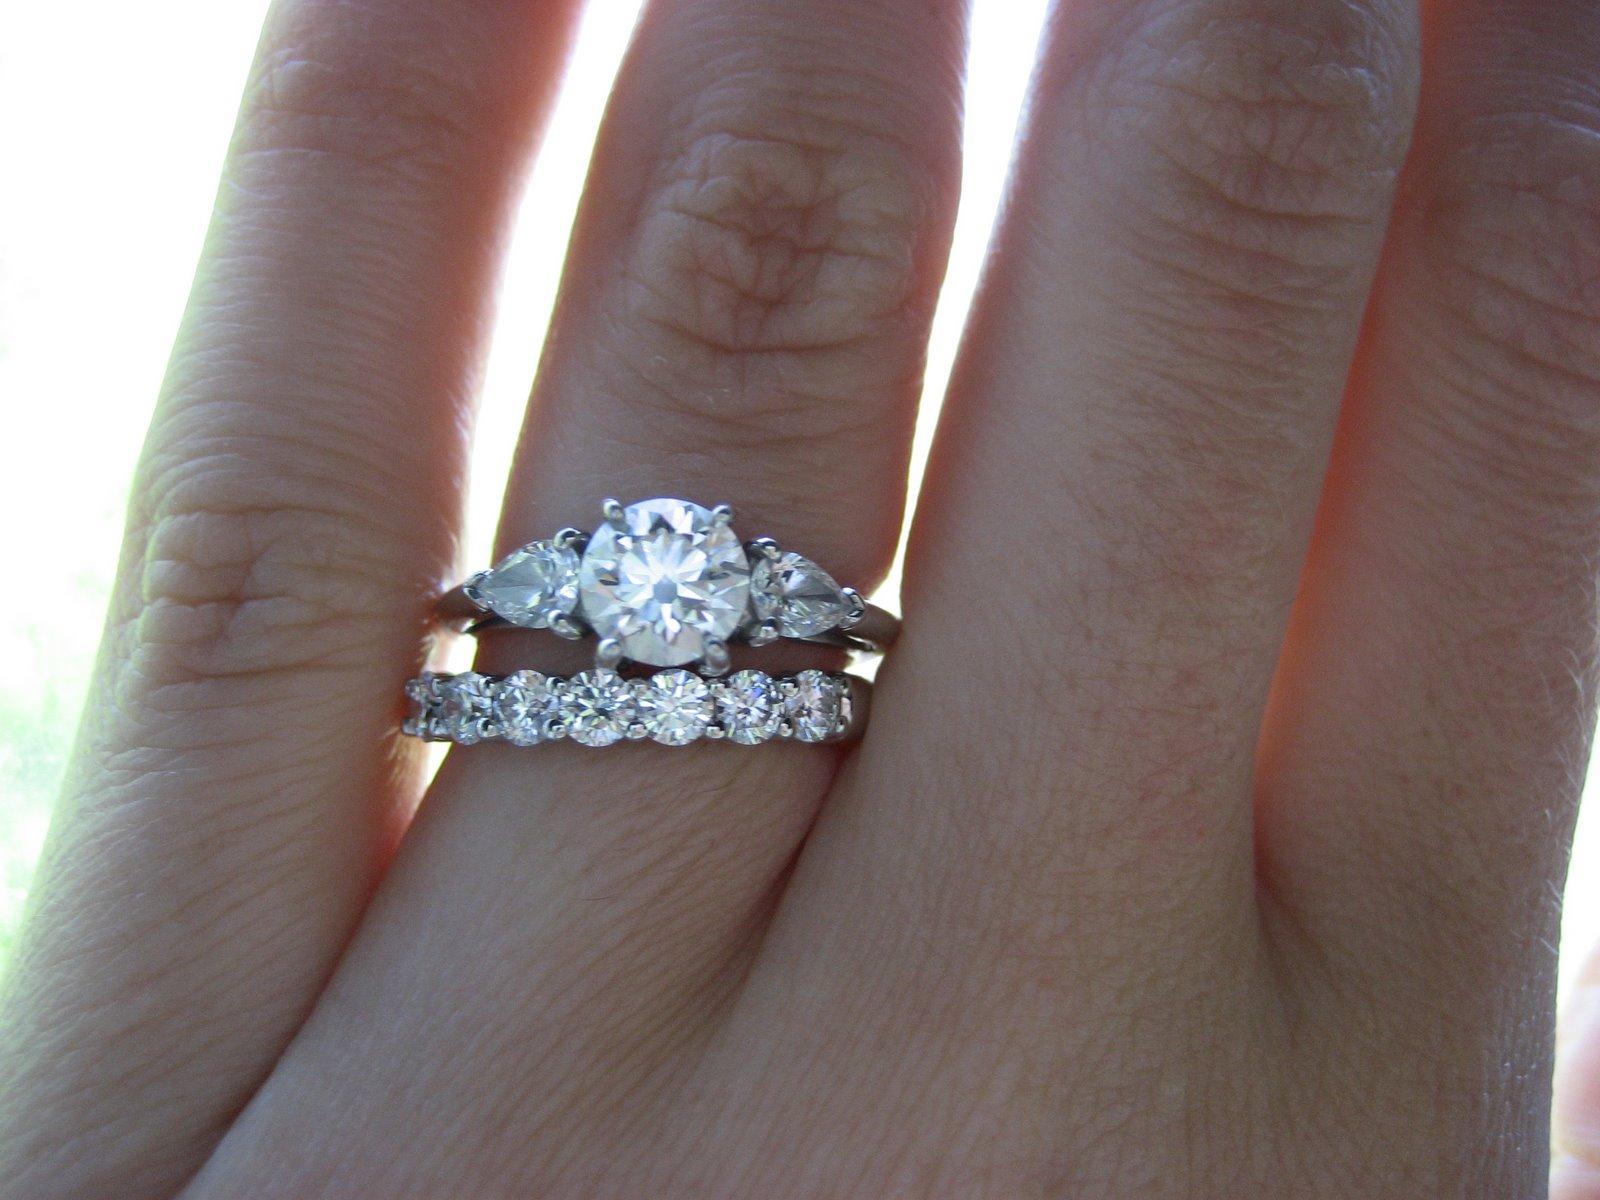 chocolate diamond wedding ring settings wedding ring settings Chocolate diamond wedding ring settings